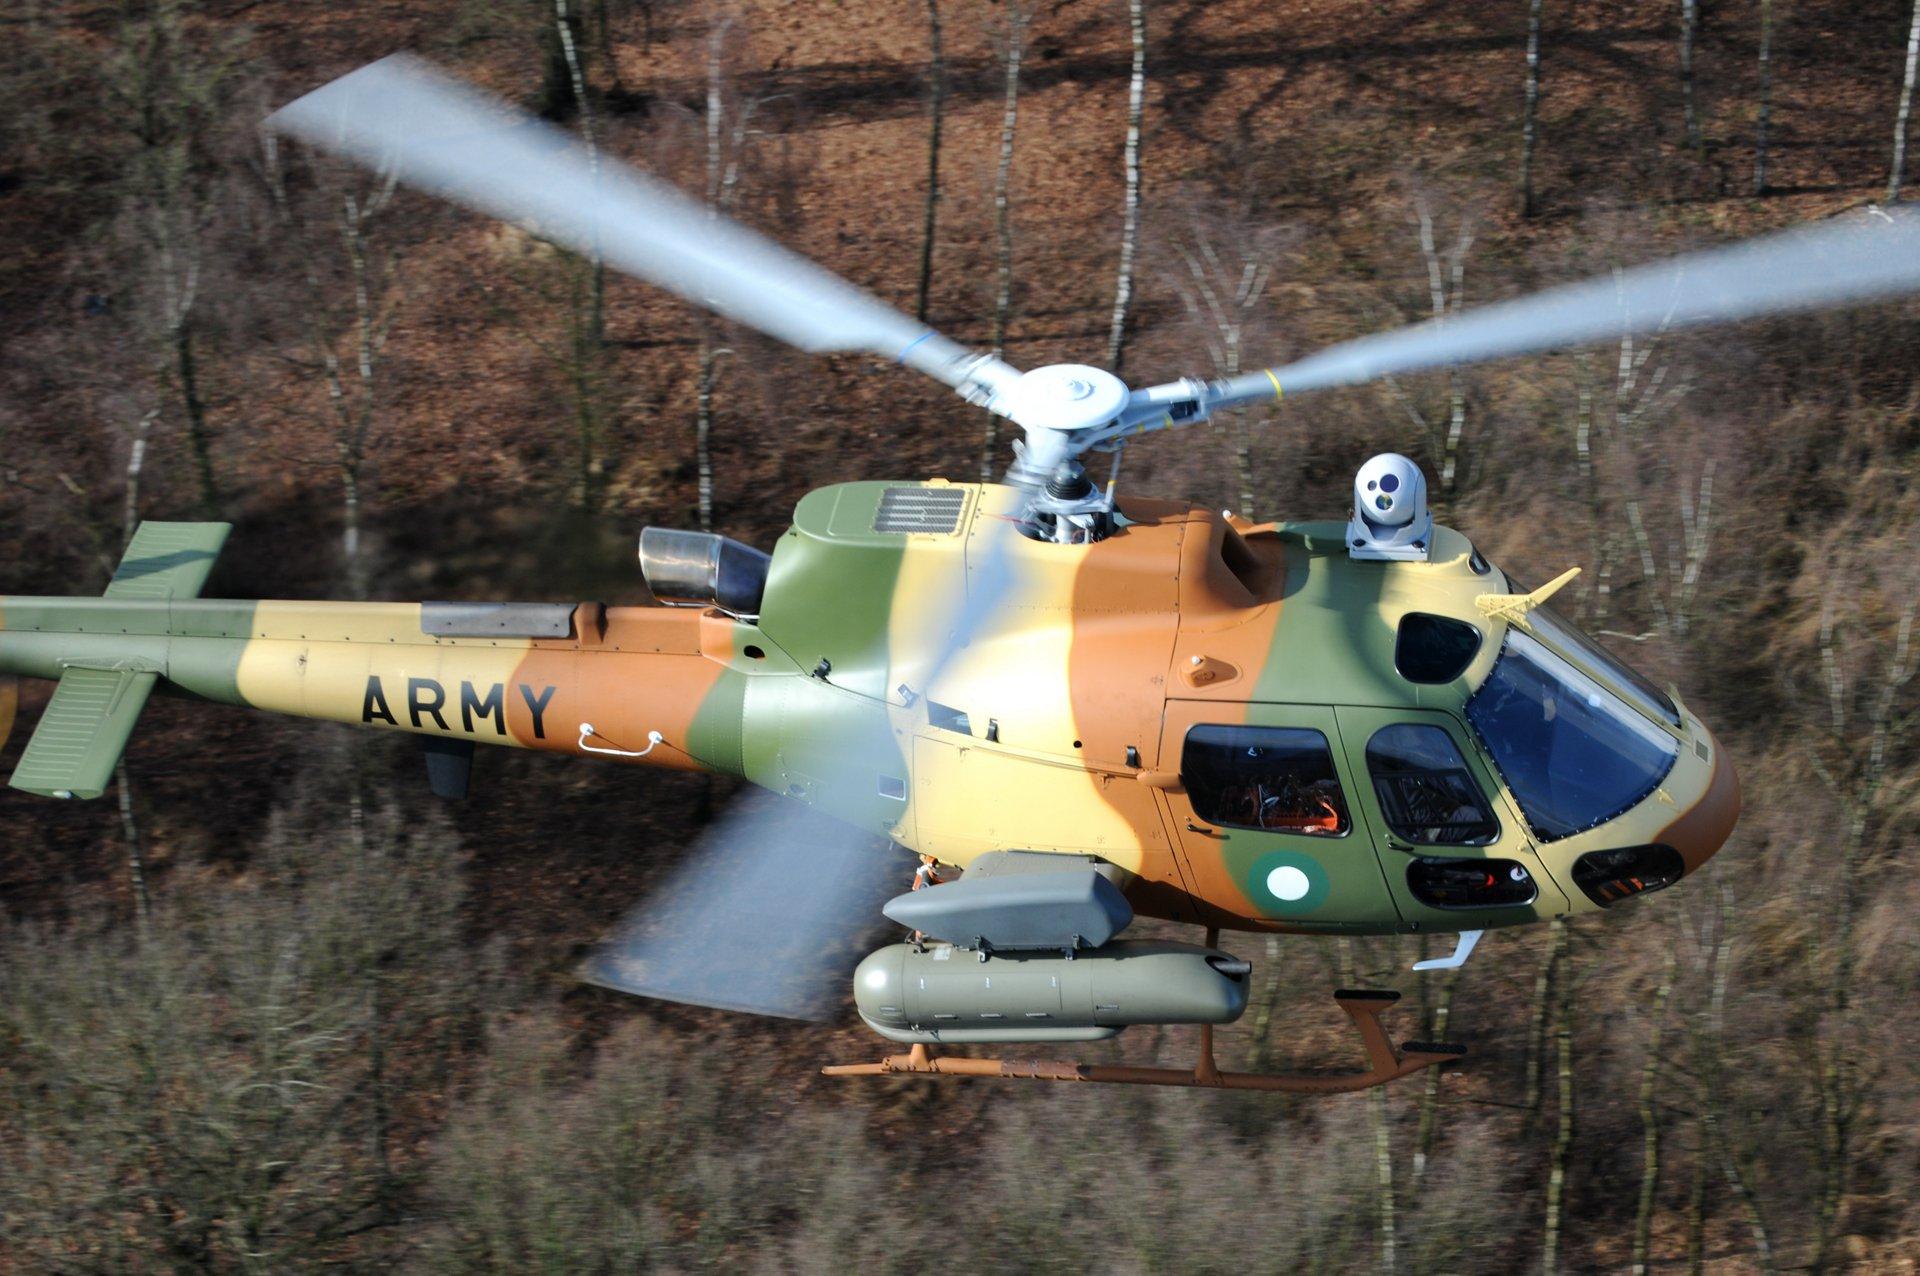 H125M for combat flights